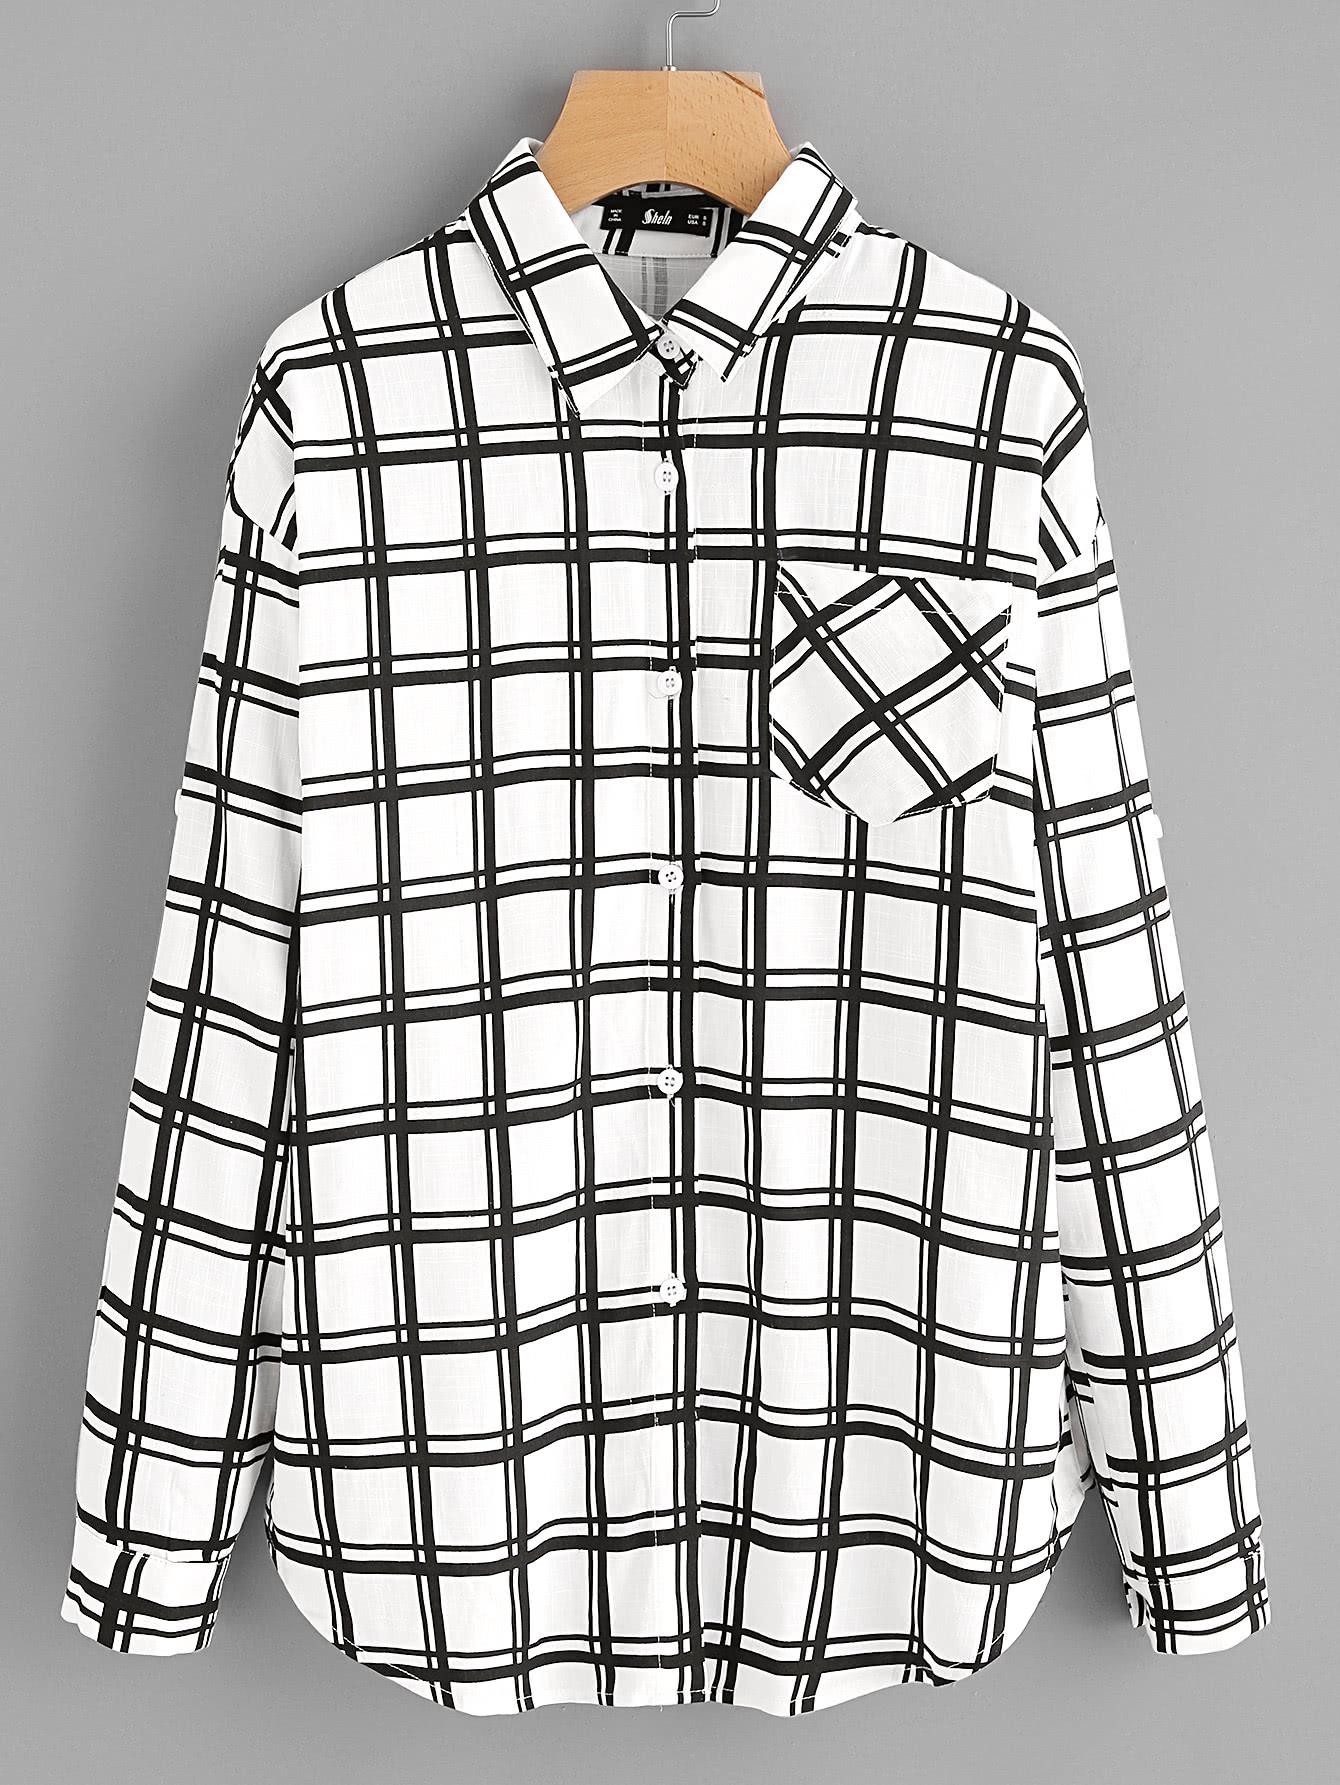 Single Pocket Roll Tab Sleeve Grid Shirt stoosh new salmon juniors roll tab sleeve plaid shirt s $34 dbfl